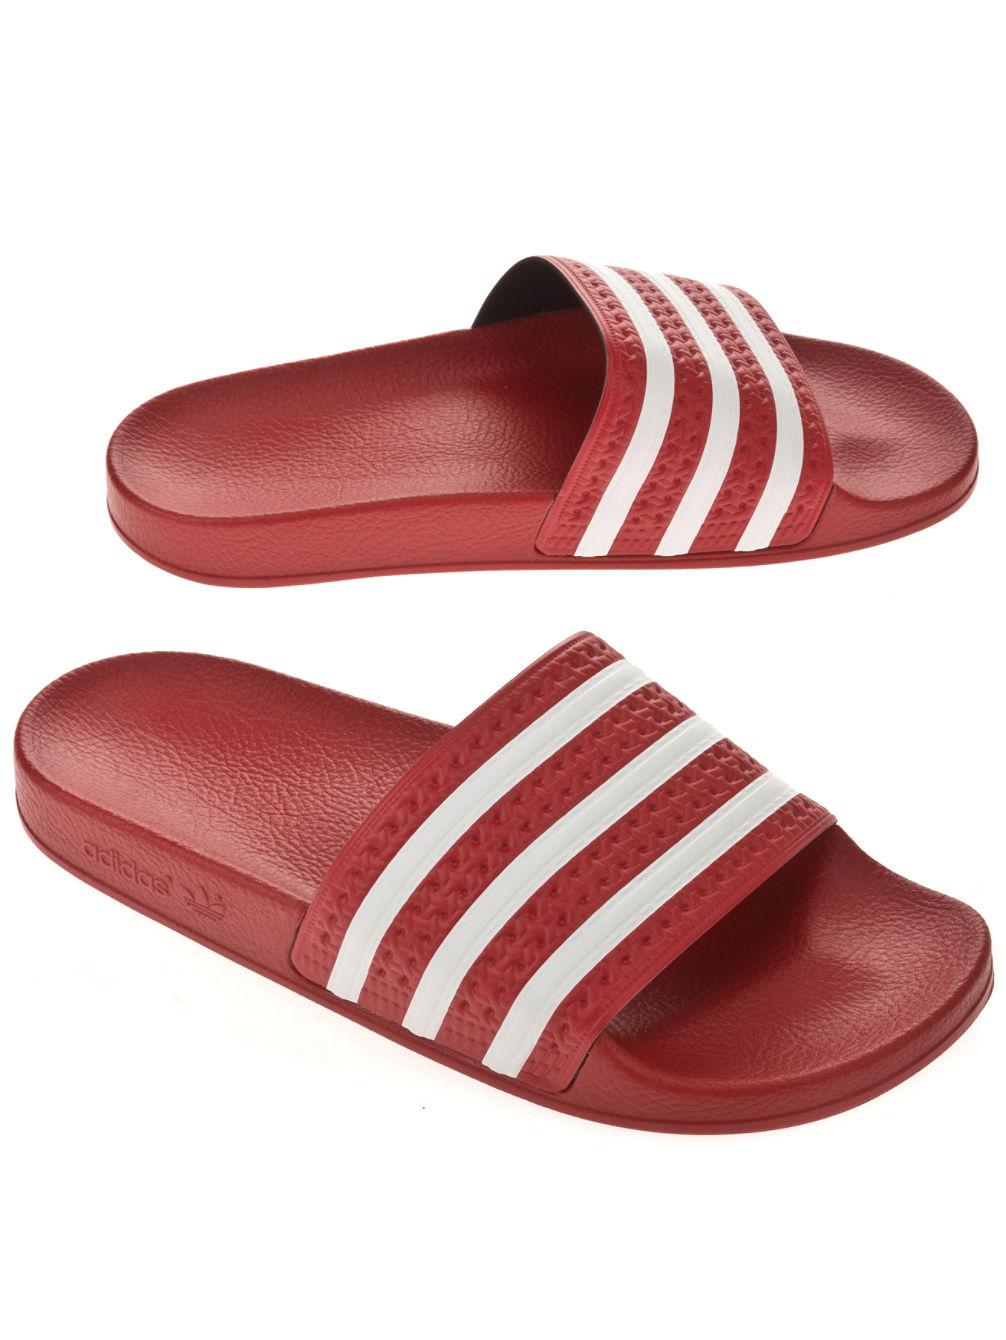 bdc9ee652927 Buy adidas Originals Adilette Sandals online at blue-tomato.com